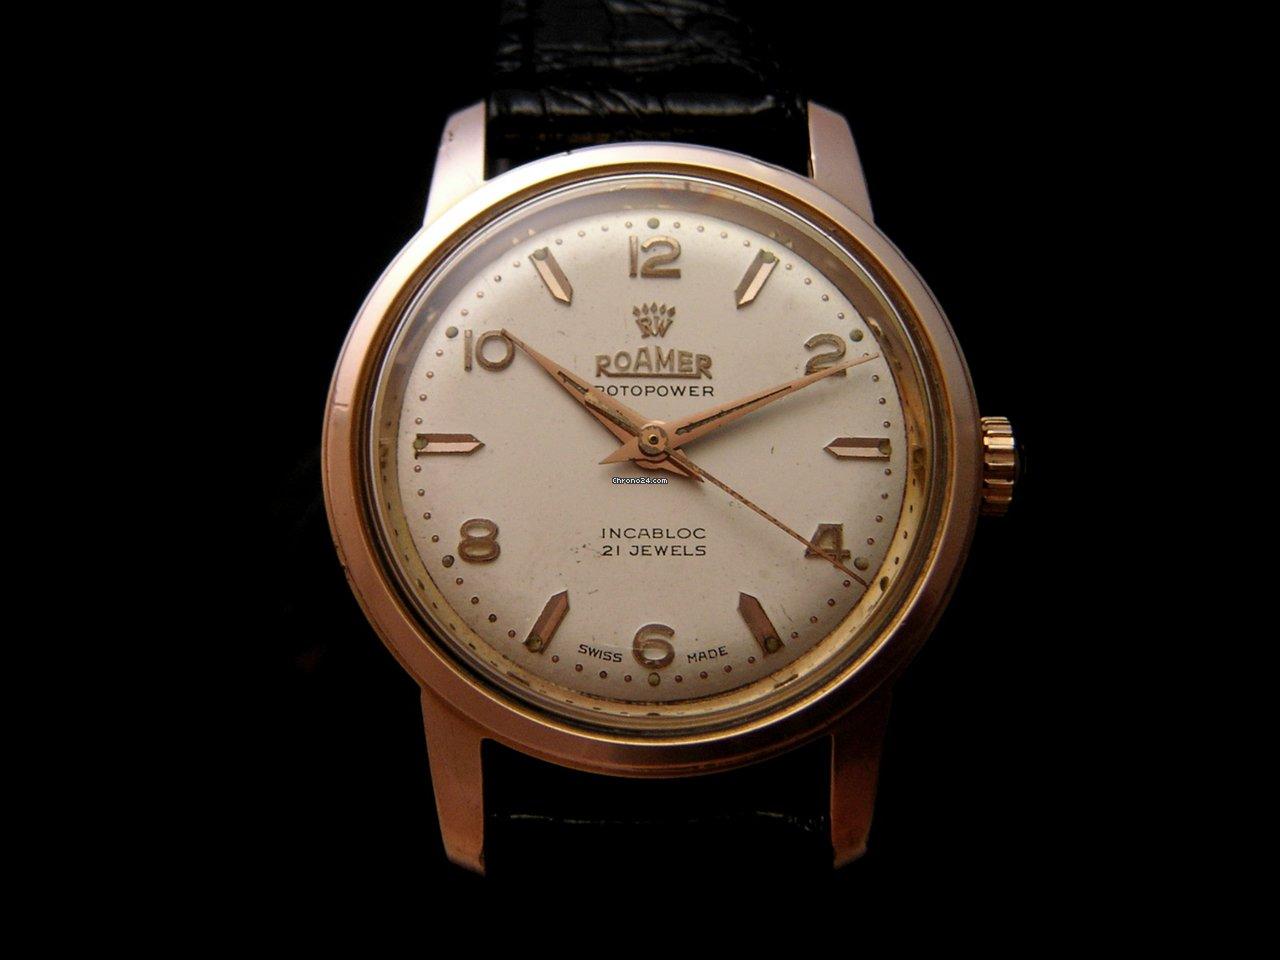 roamer vintage rotopower watch 60 39 s sold on chrono24. Black Bedroom Furniture Sets. Home Design Ideas